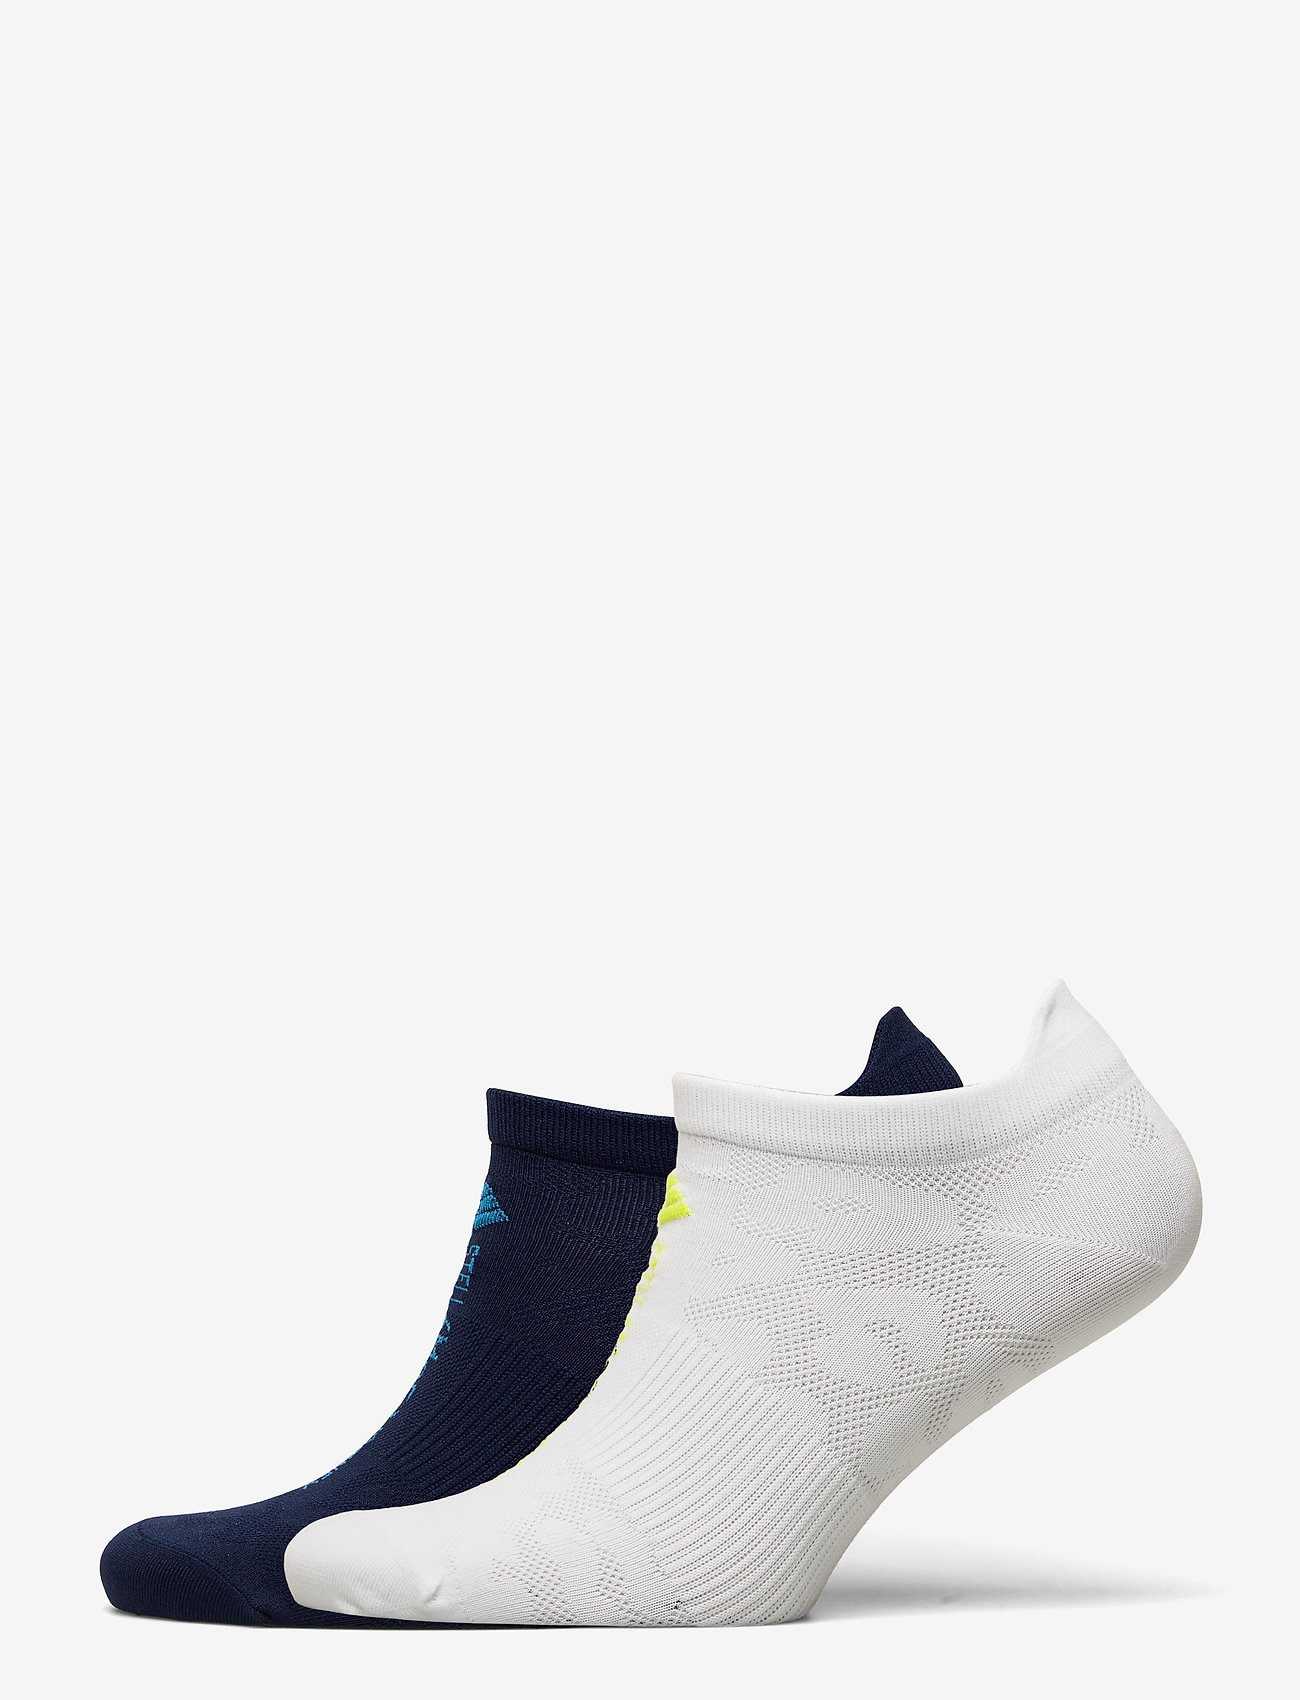 adidas by Stella McCartney - aSMC SOCKS - ankelstrumpor - white/aciyel/conavy/b - 0